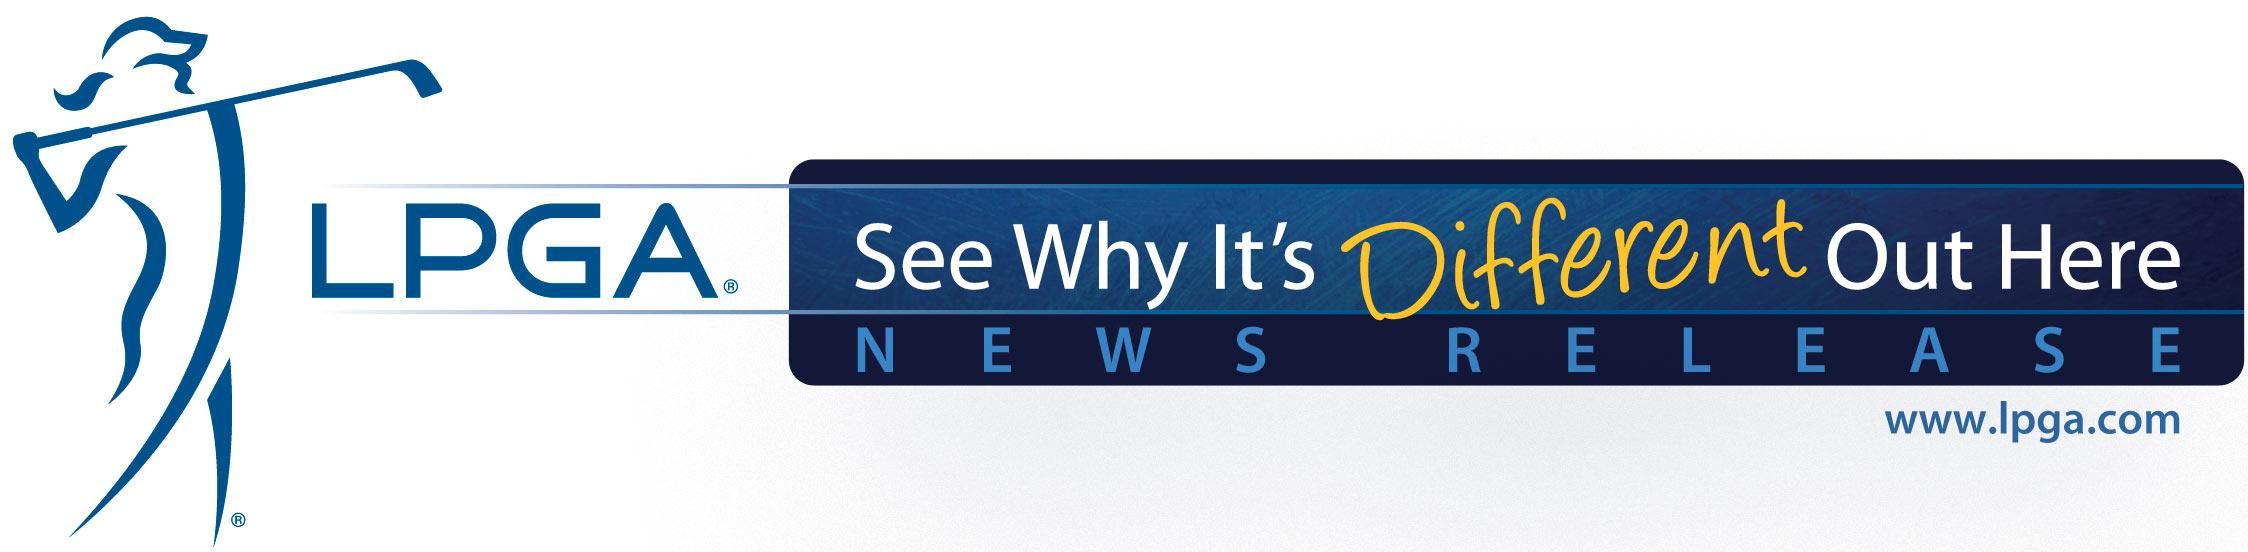 lpga logo murphy knott public relations inc